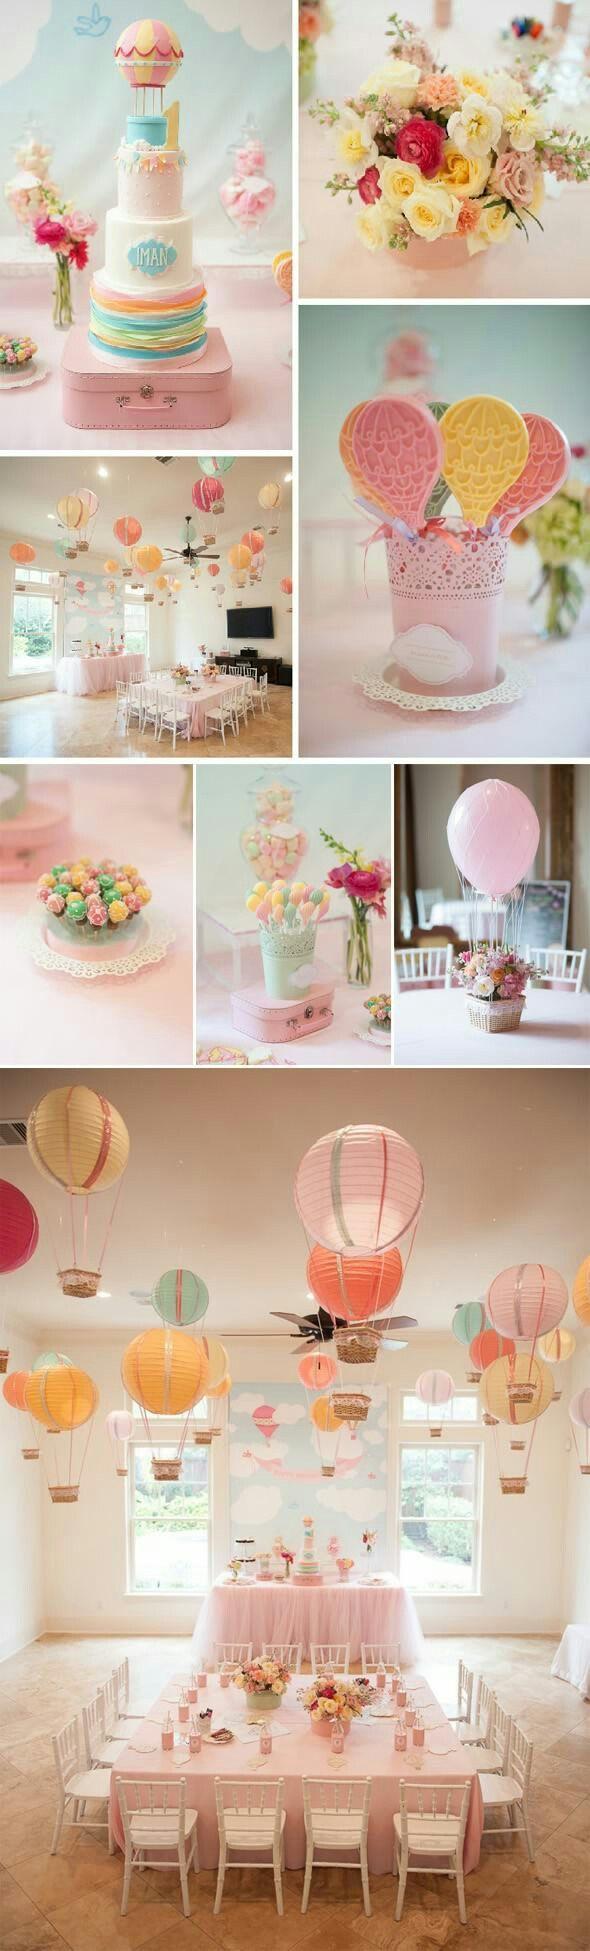 Babyshower, Balloon Party, Balloon Cake, Hot Air Balloons, Air Ballon, Oi  Gente, Birthday Ideas, 20 Birthday, Birthday Decorations